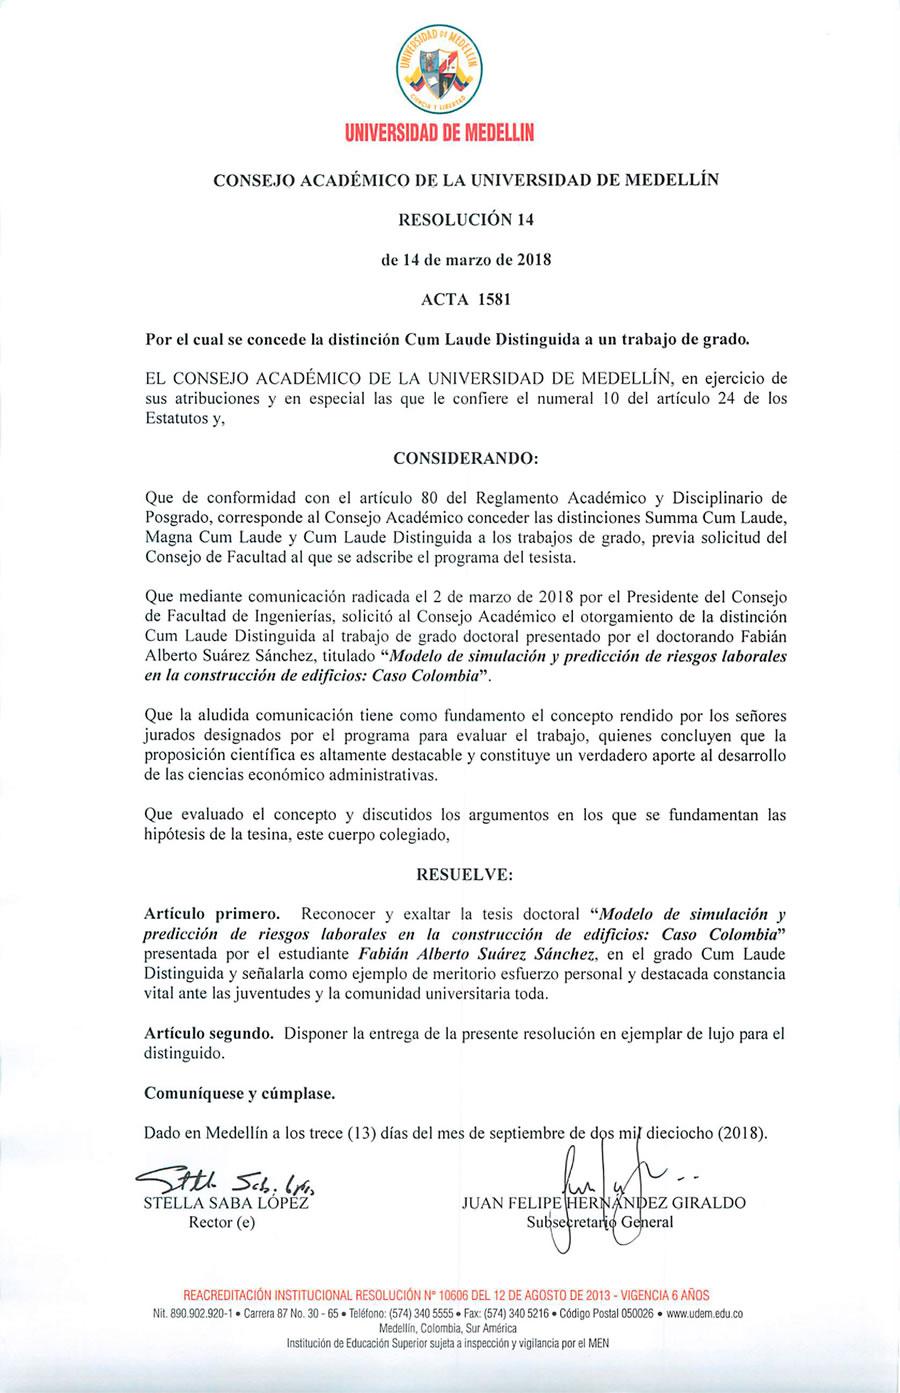 resolucion-tesis-doctoral-Fabian-Suarez